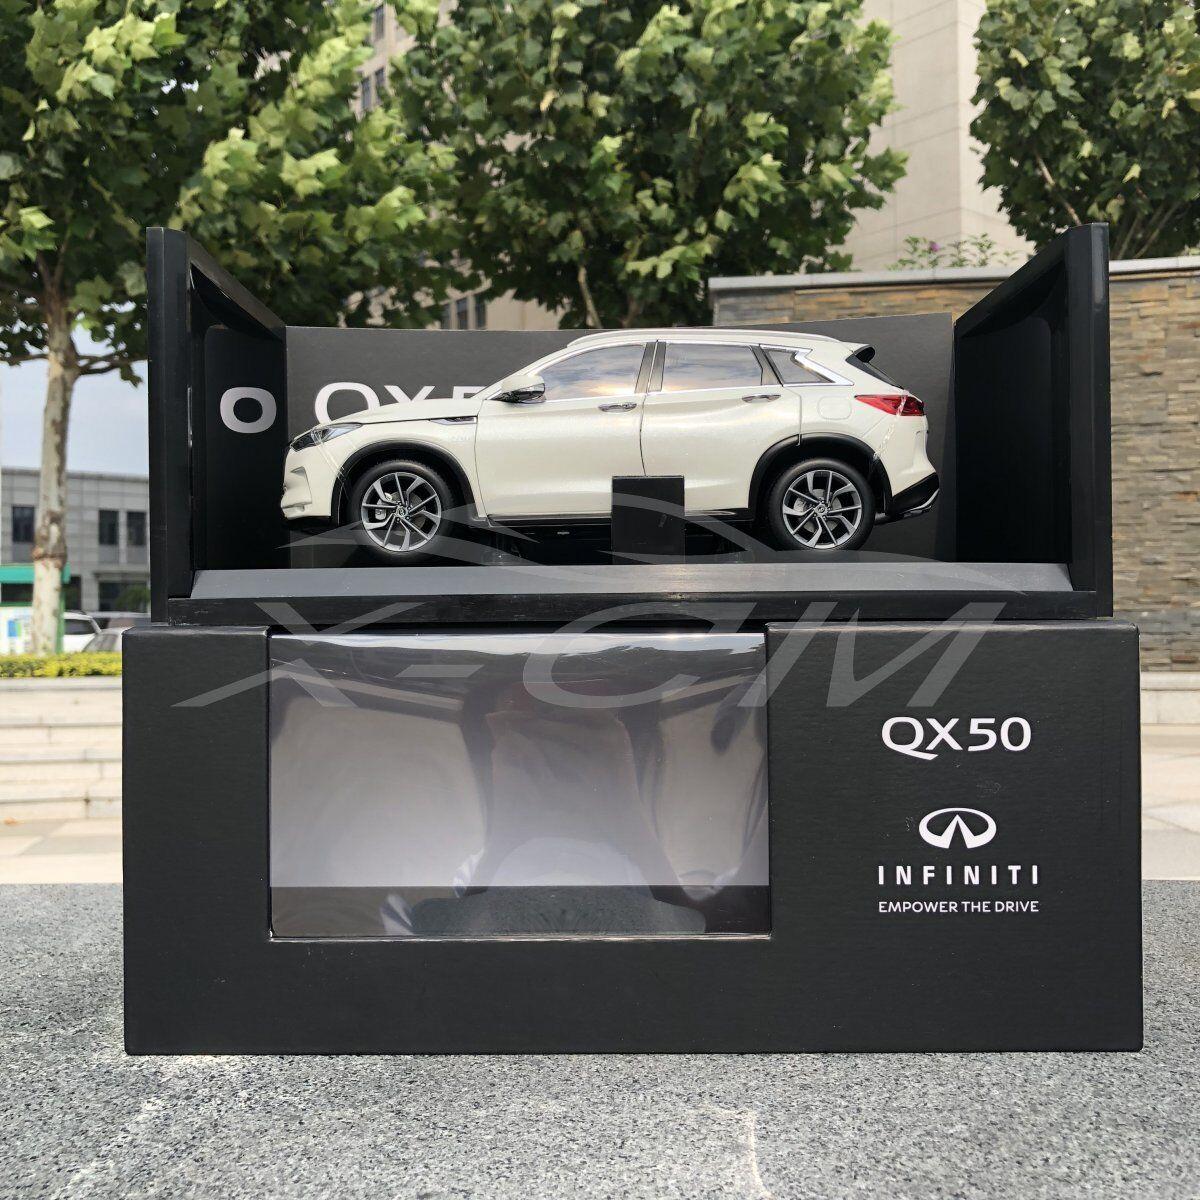 Diecast Car Model Keng Fai Dong Feng Infiniti New QX50 1 18 (White) + GIFT